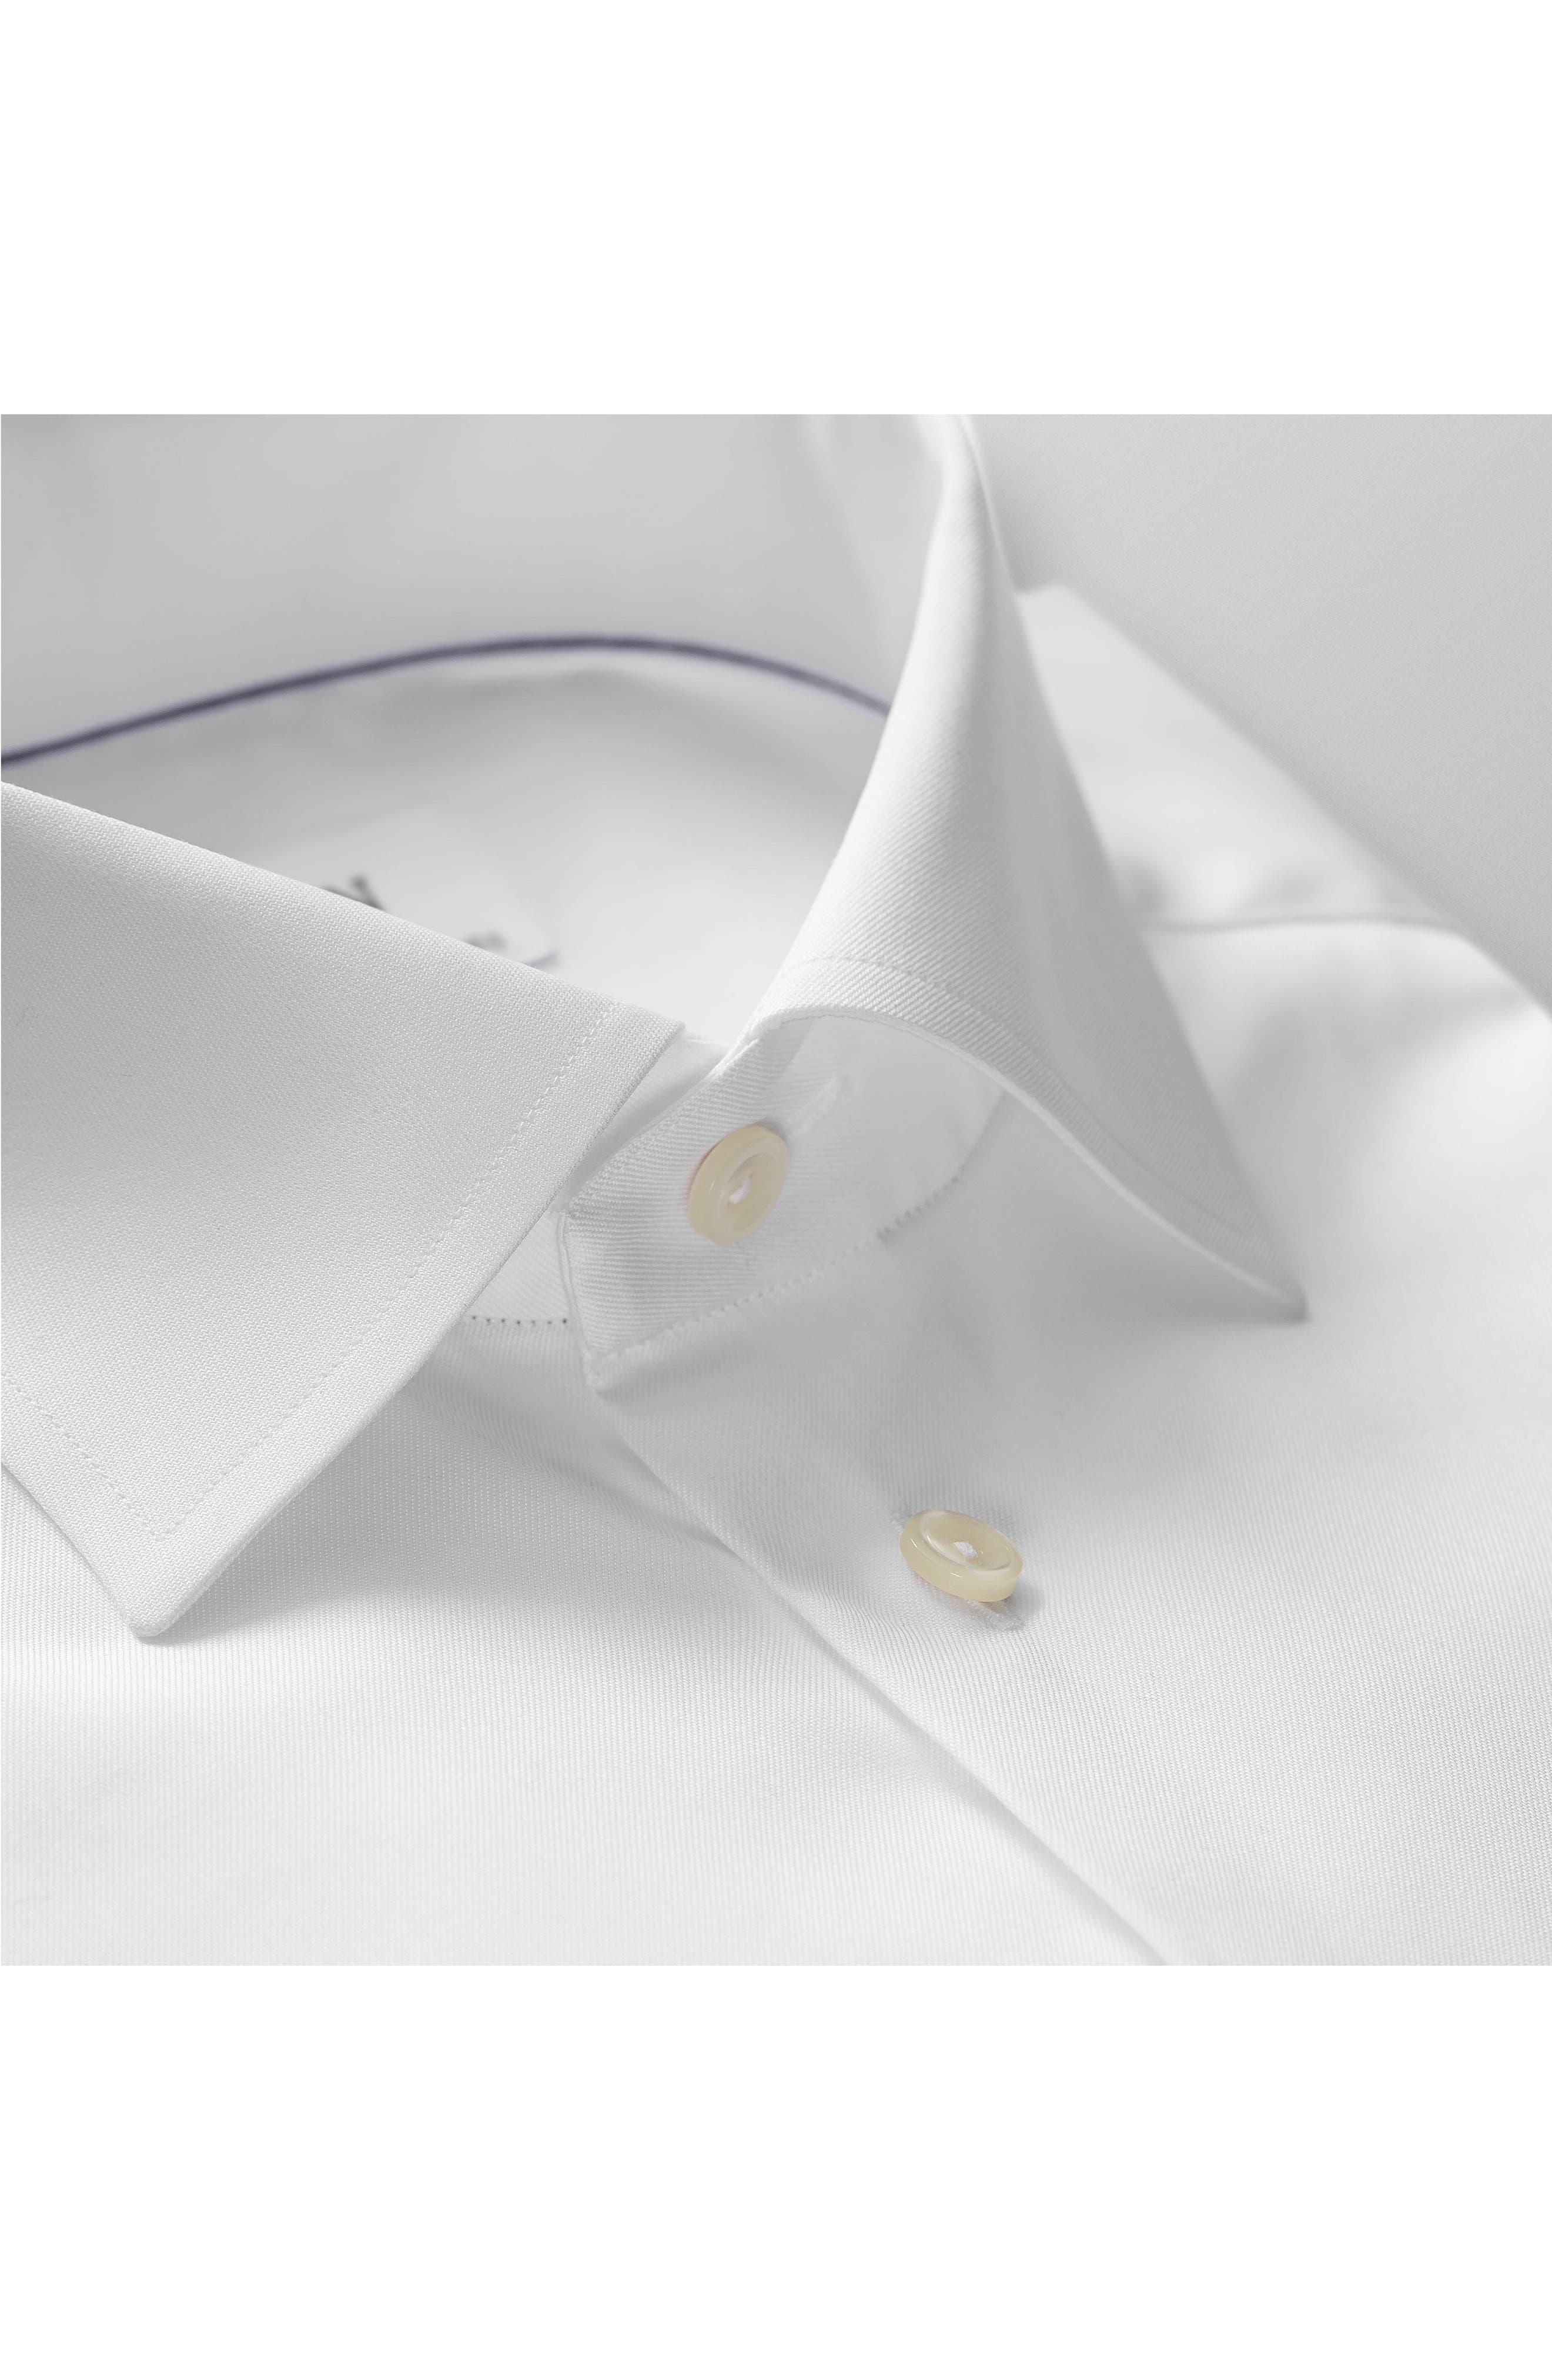 ETON, Slim Fit Twill Dress Shirt, Alternate thumbnail 6, color, WHITE